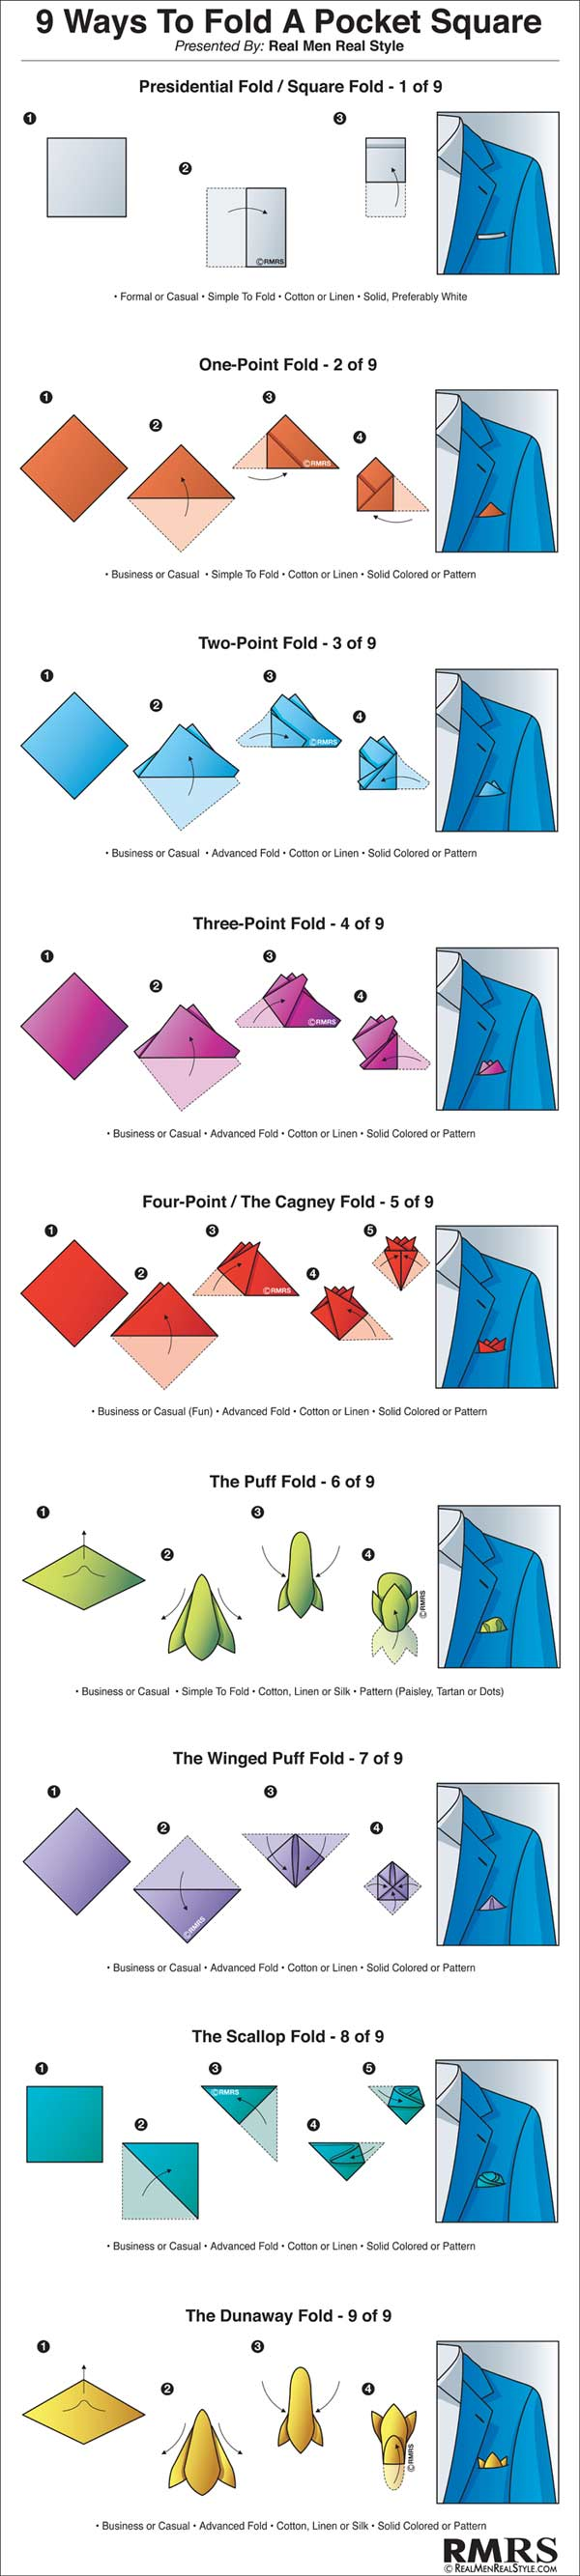 How To Fold A Pocket Square 9 Ways Of Folding A Handkerchief